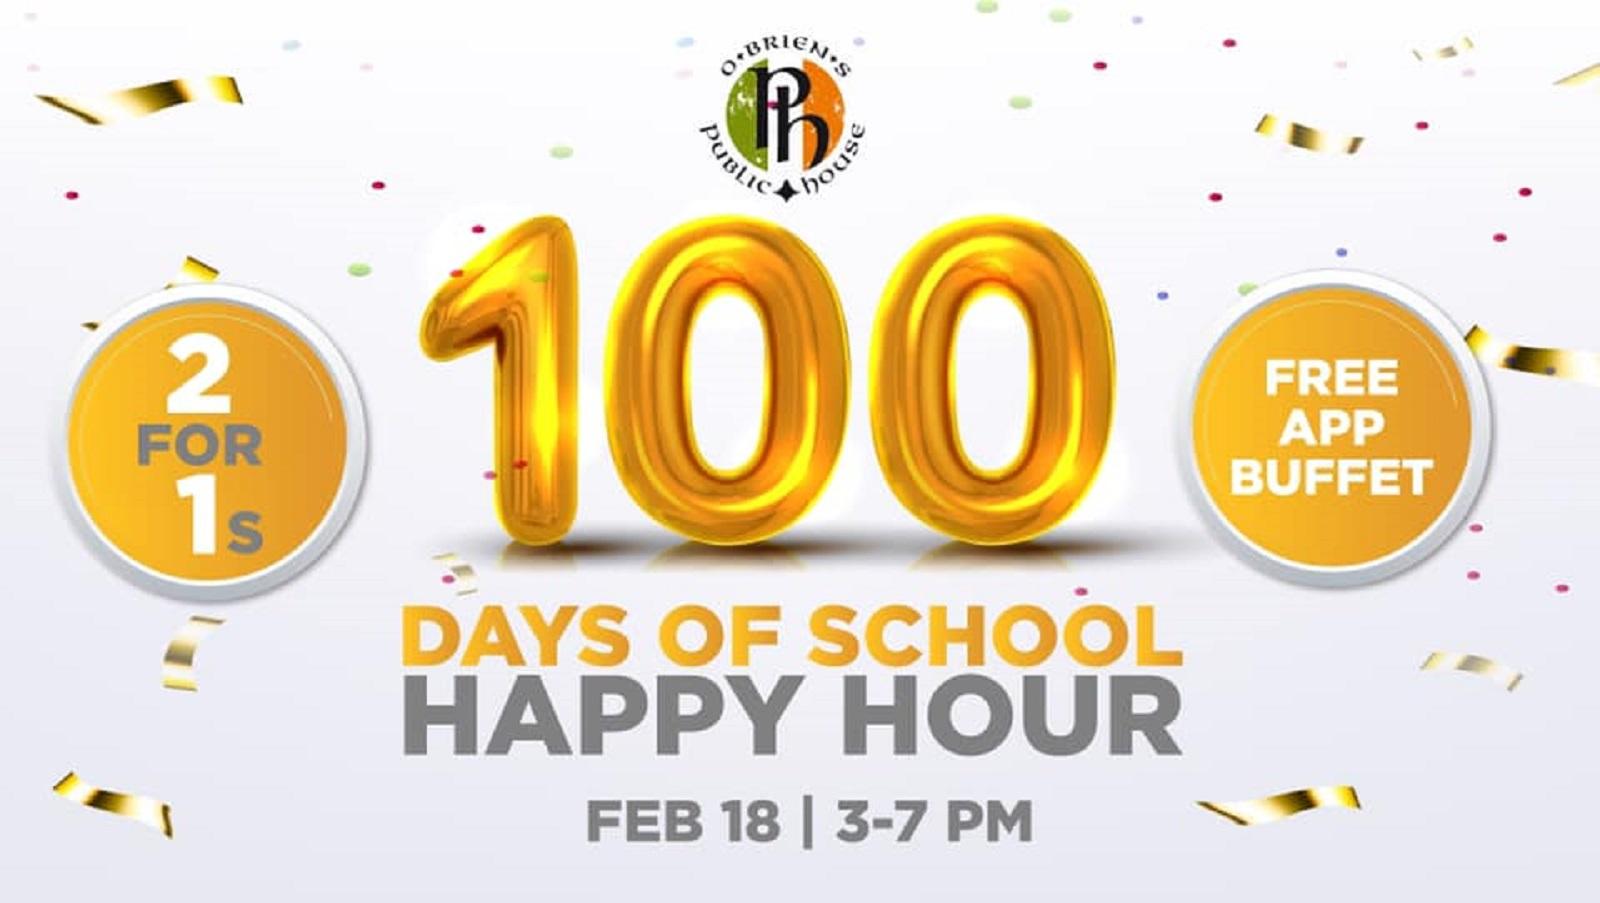 100 Days of School Happy Hour